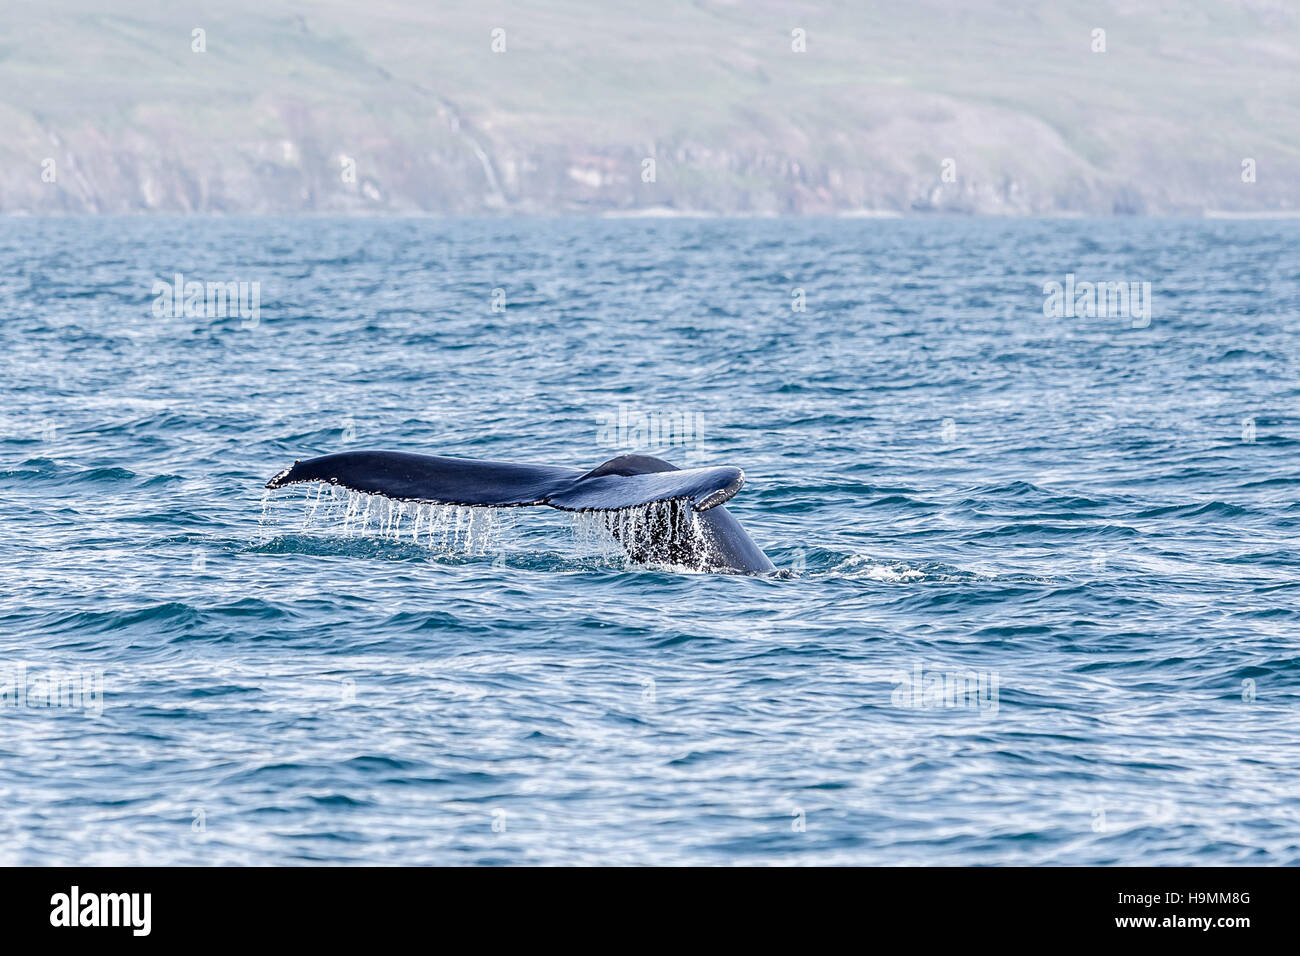 Whale watching, Iceland, Humpback whale, Megaptera Novaeangliae, Hnufubakur, Sea, seaside, fin, flipper - Stock Image